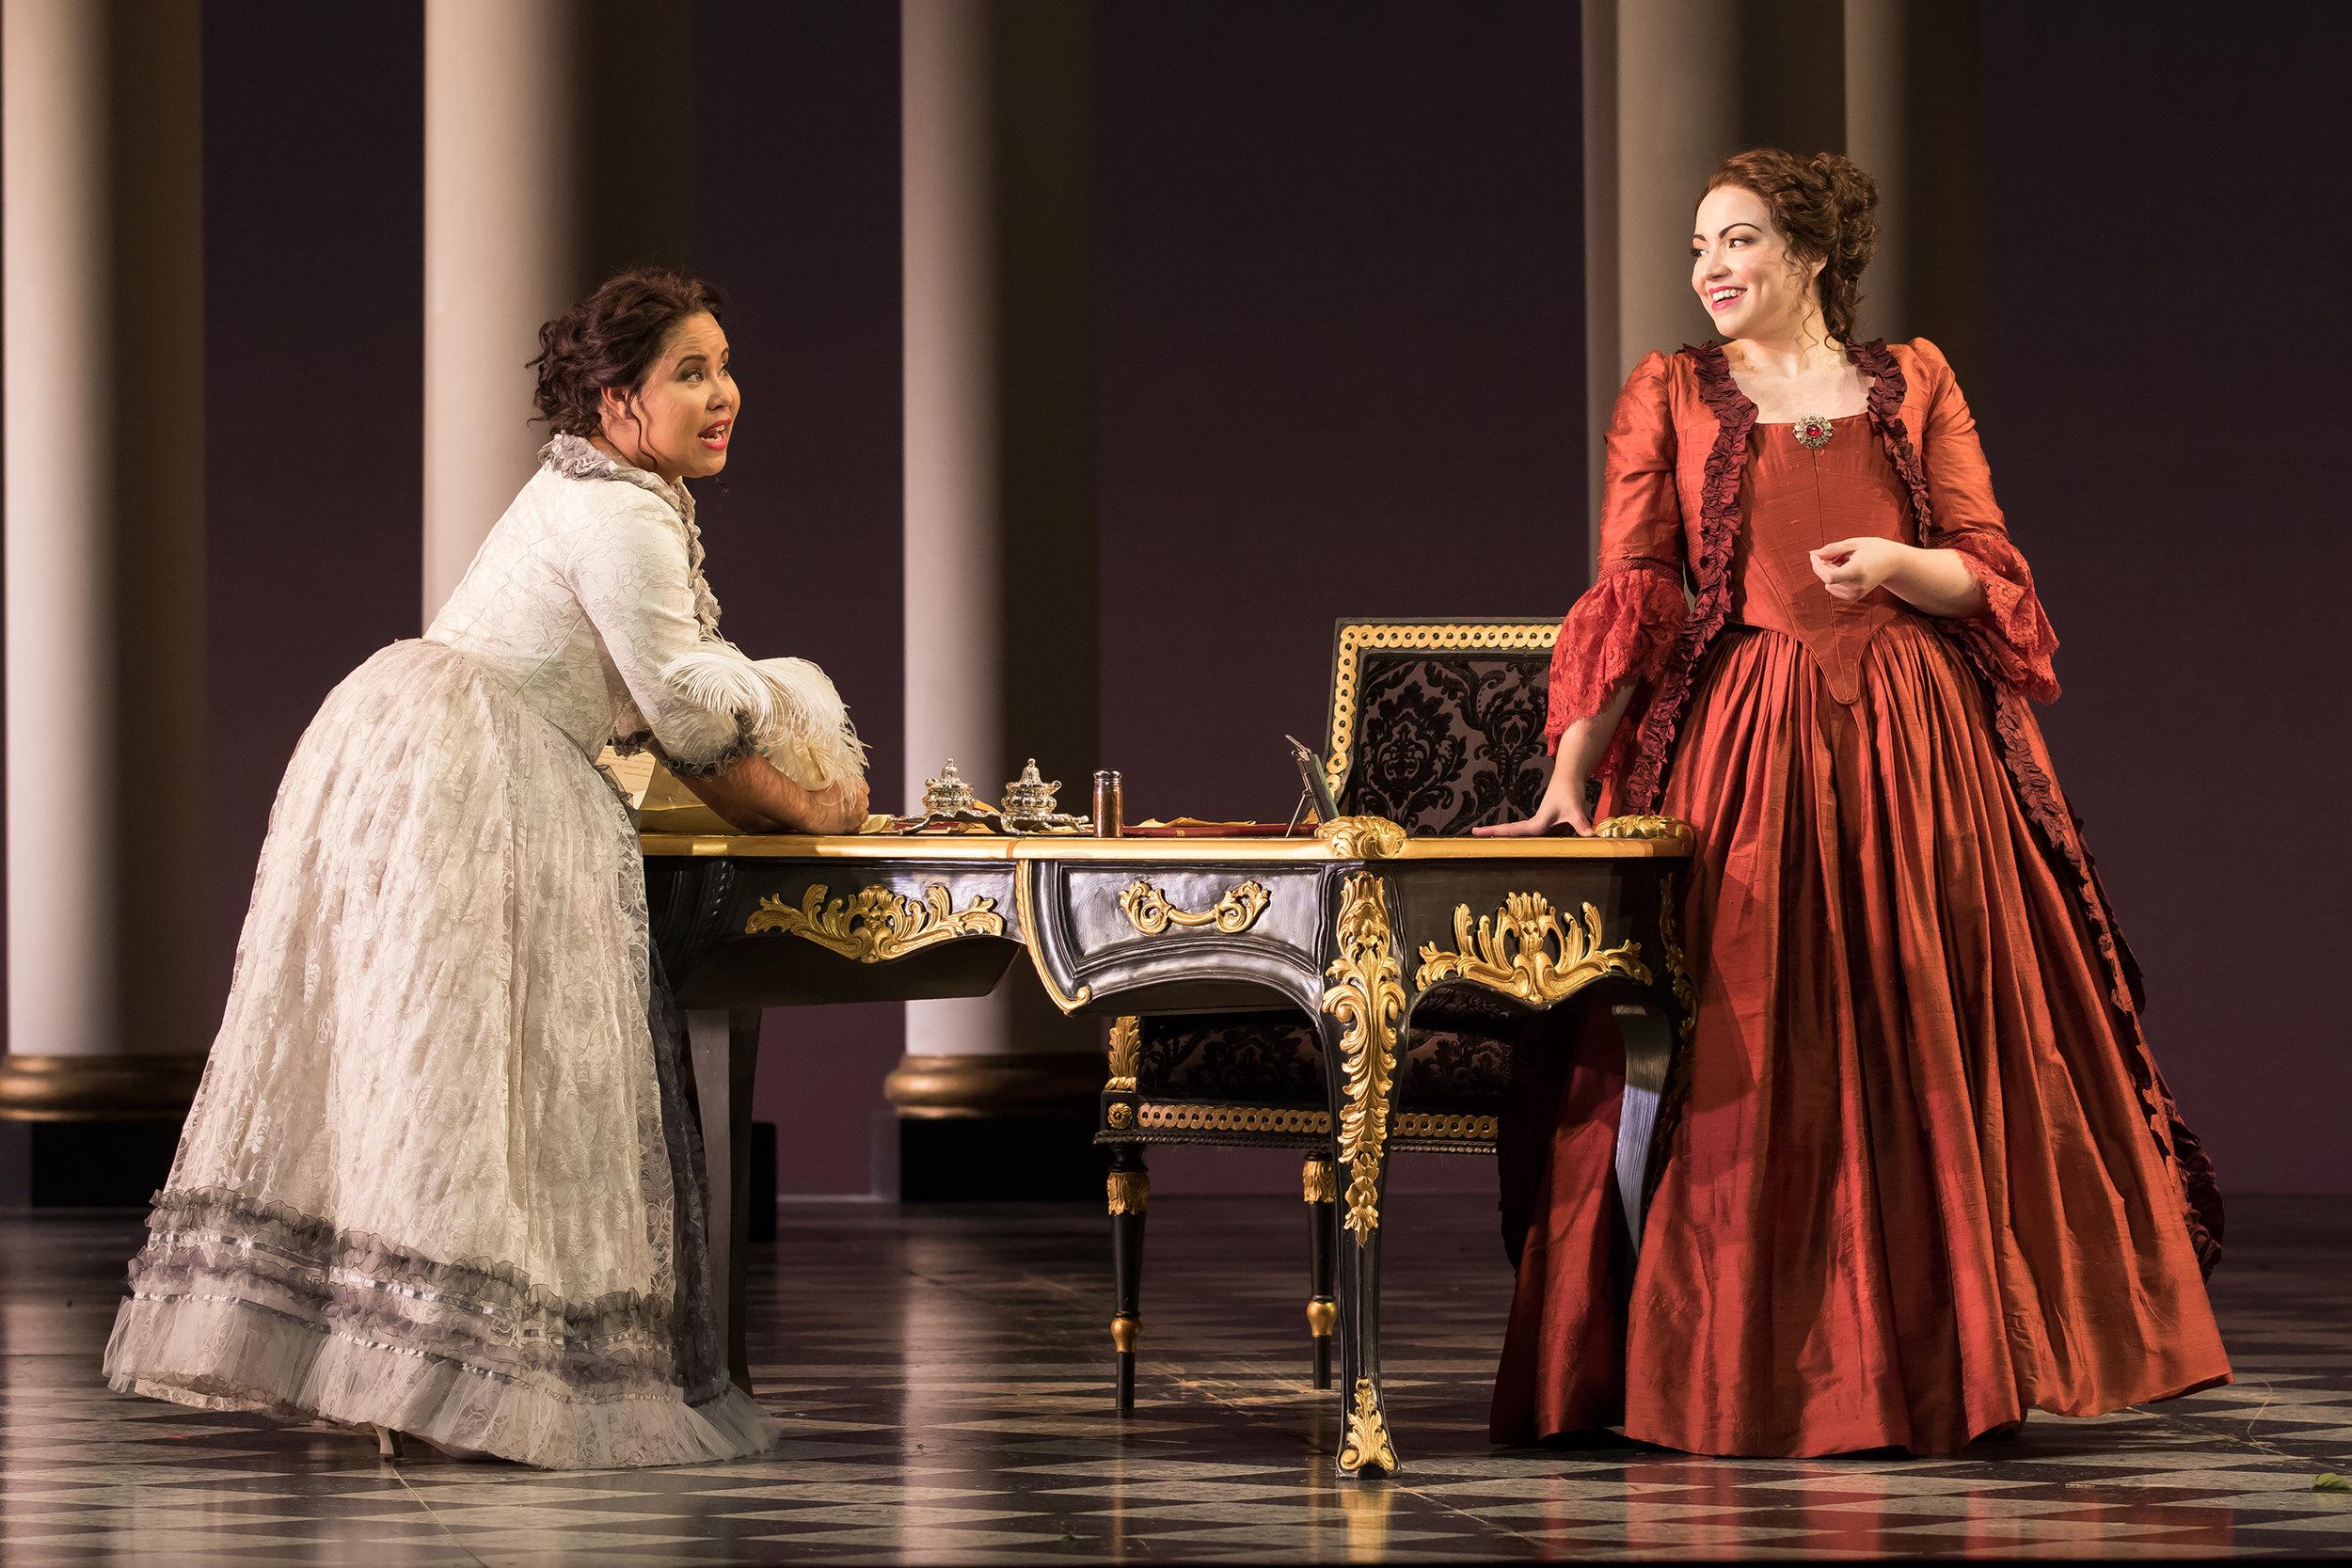 Ariana Wehr (Susanna) with Raquel Gonzalez (Contessa Almaviva) in Washington National Opera's 2016 Emerging Artist Production of Le Nozze di Figaro.              Photo Credit: Scott Suchman.